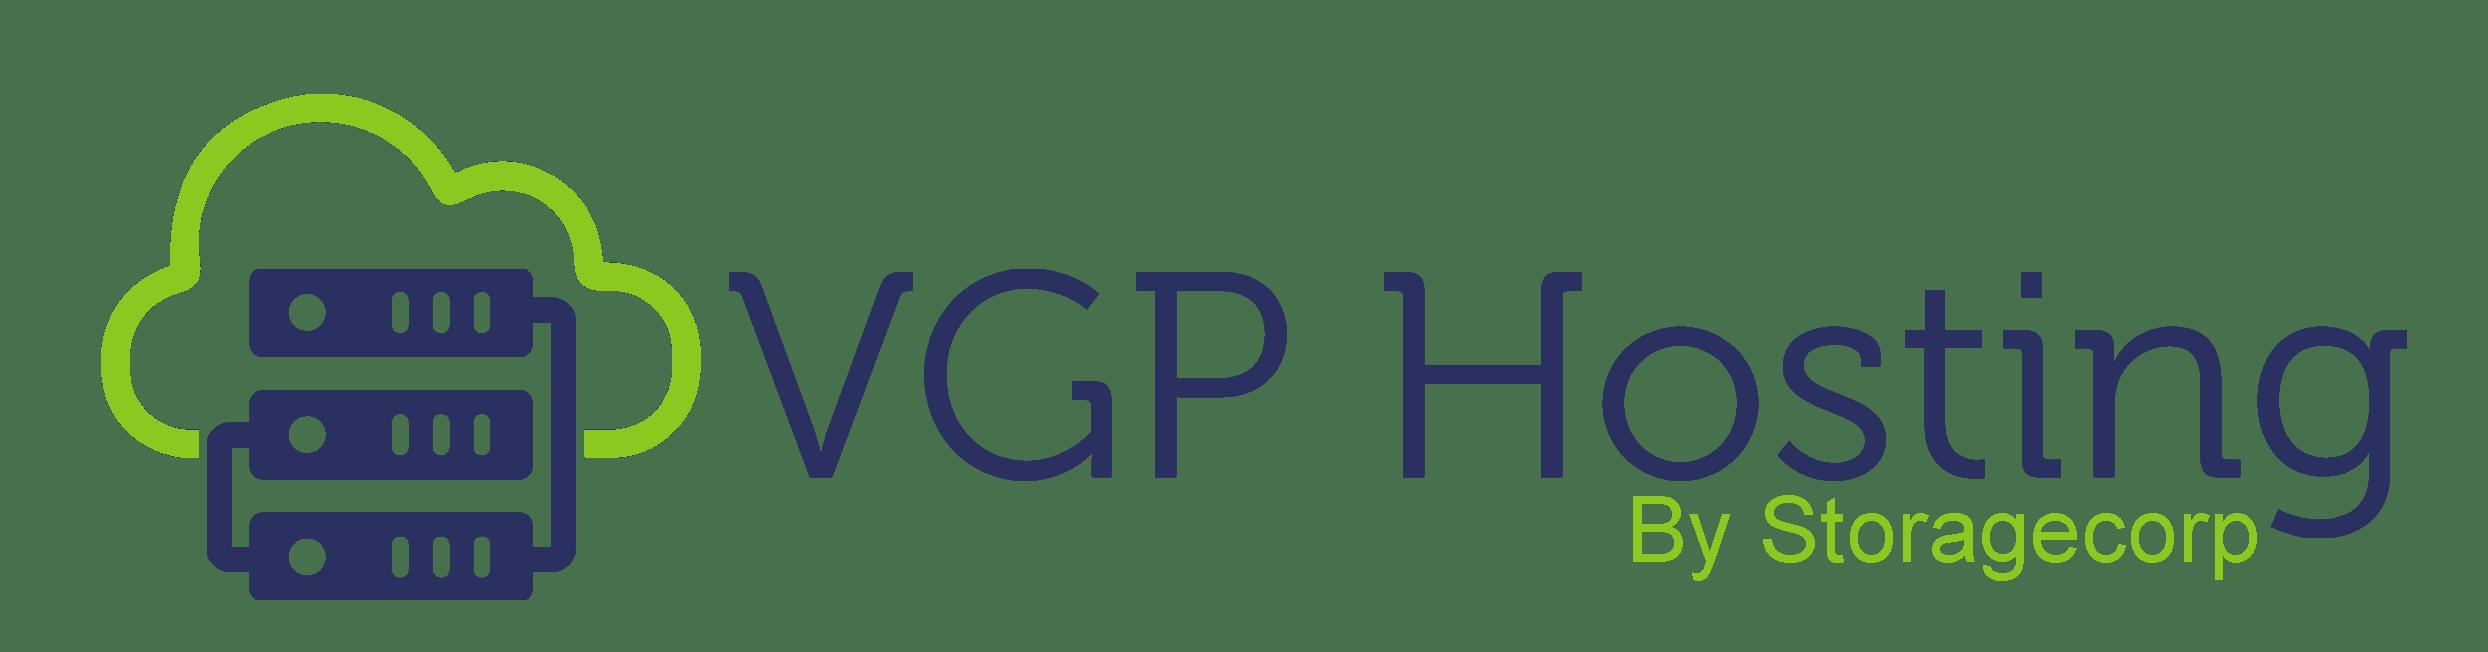 VGP Hosting